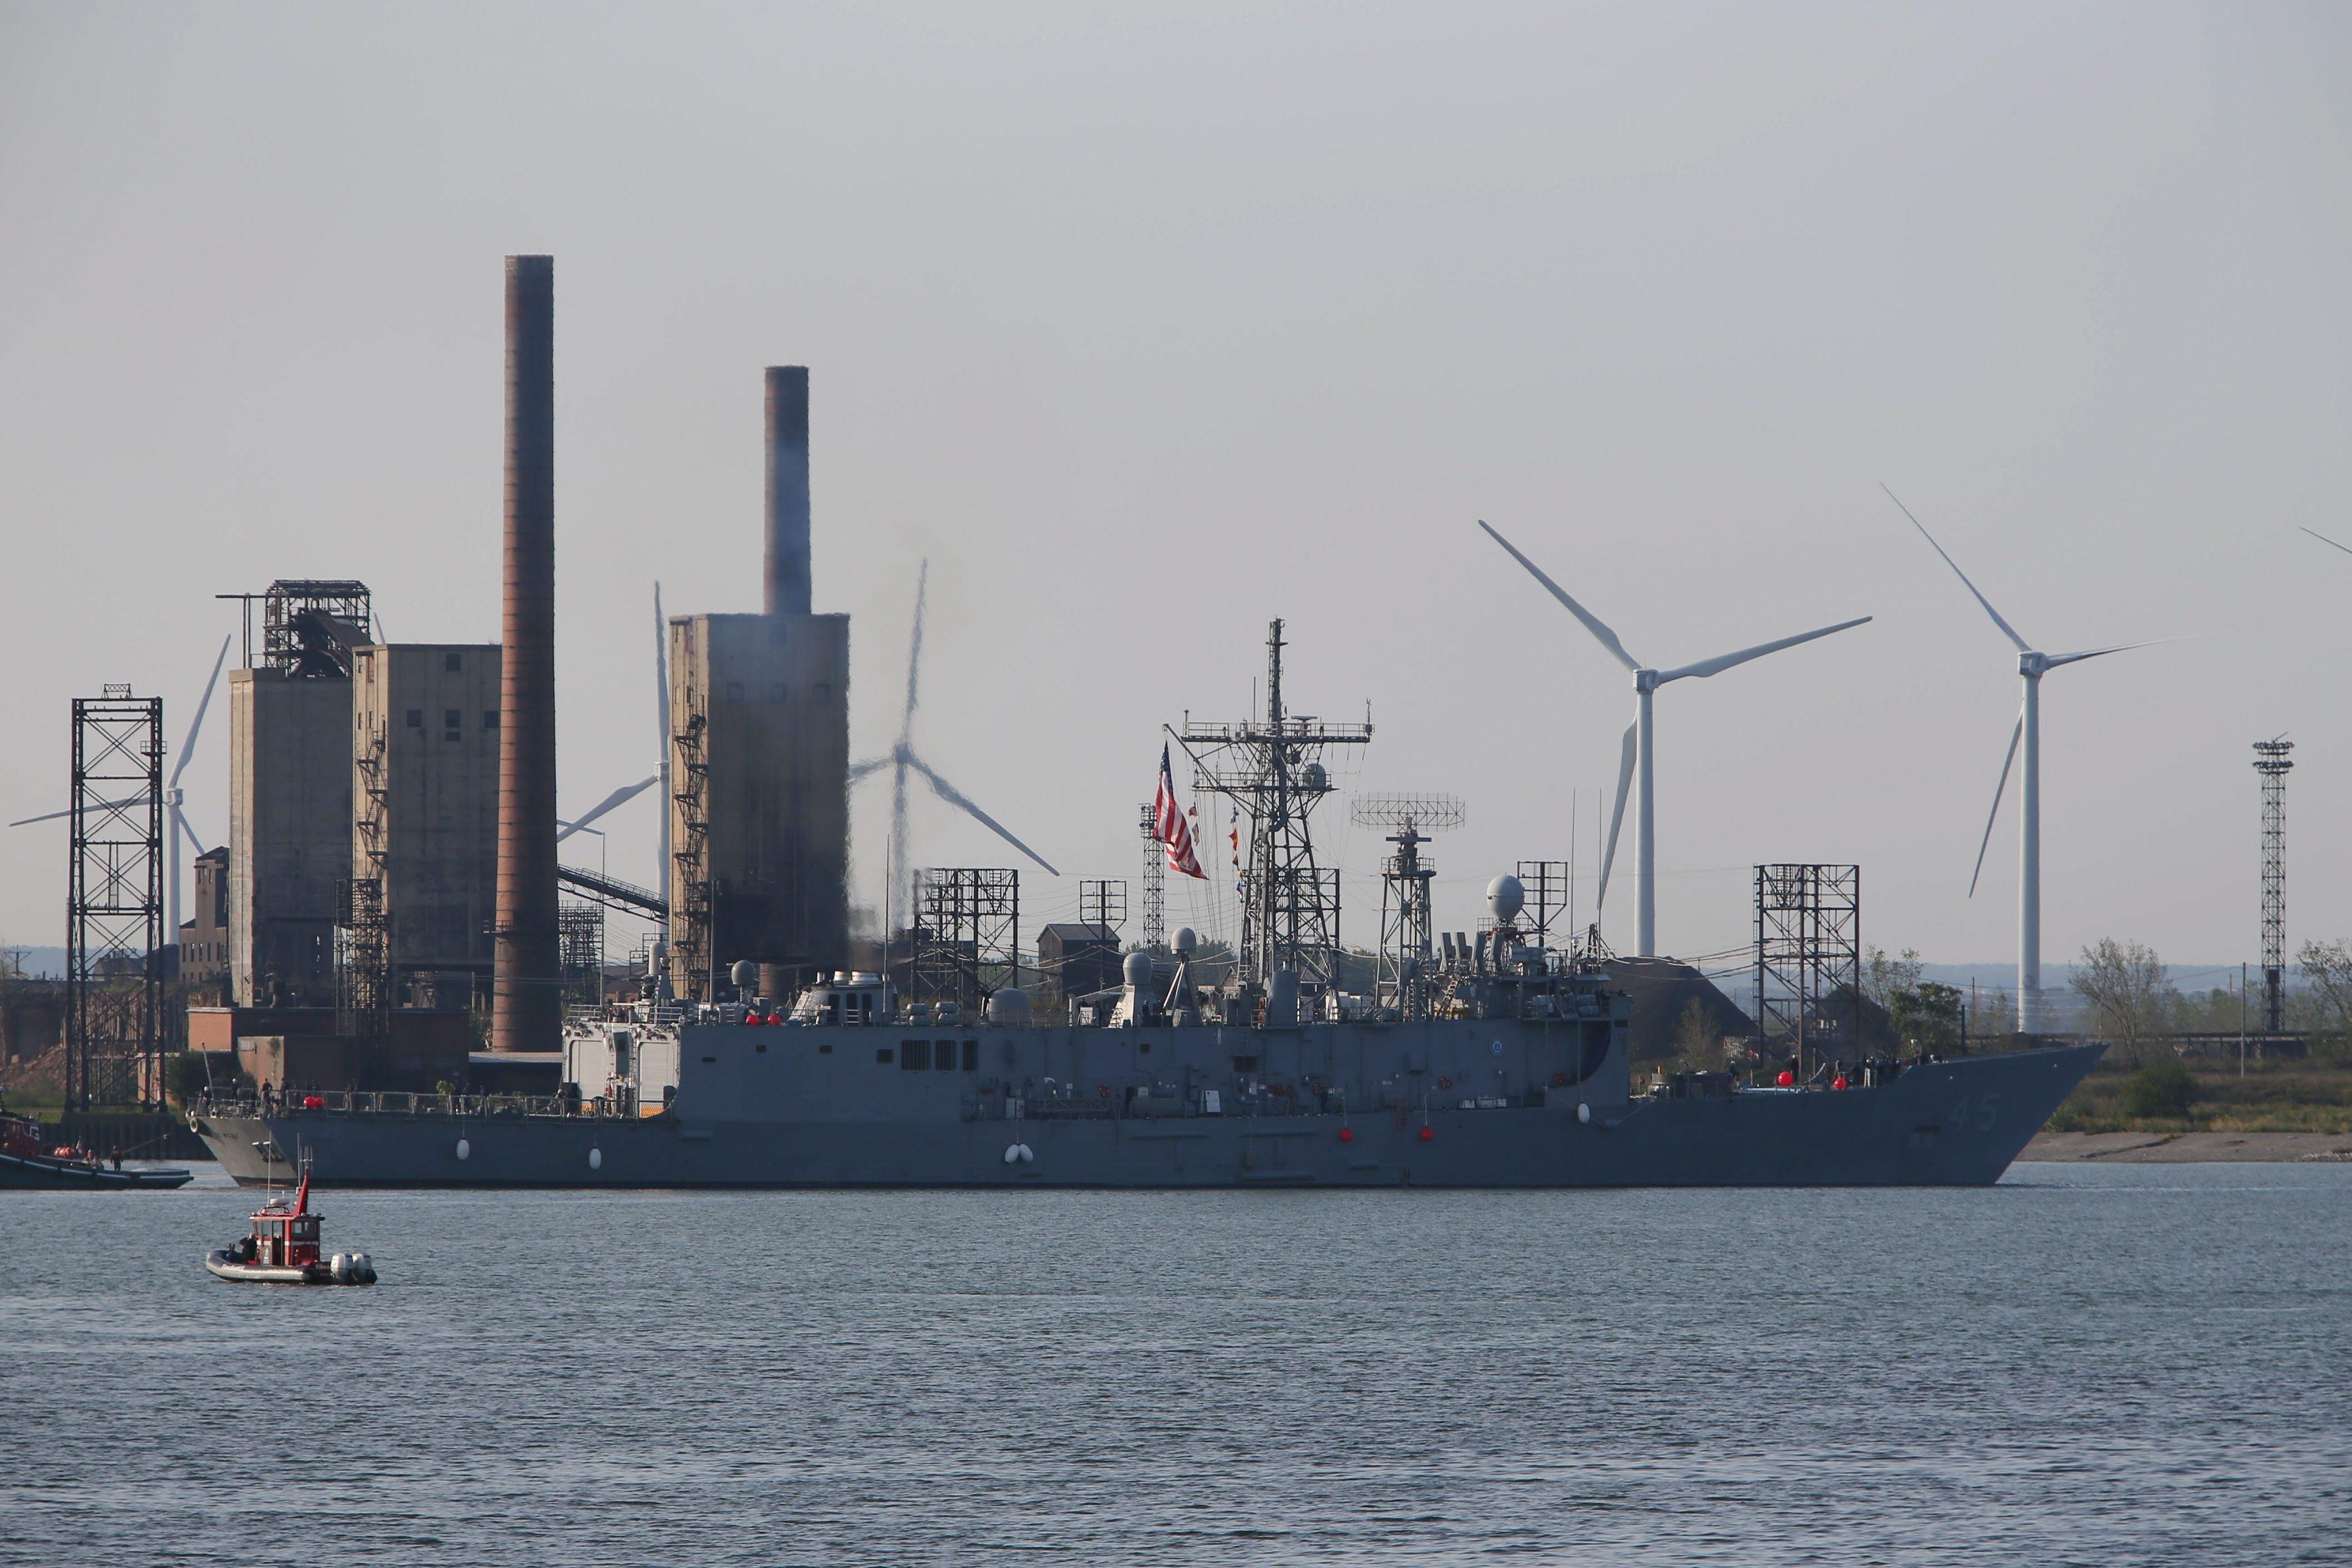 Derek Gee/Buffalo News    U.S. Navy warship USS De Wert leaves Buffalo on Monday after spending five days in the Queen City for Navy Week.  The De Wert is now heading back to its home port in Jacksonville, Fla.